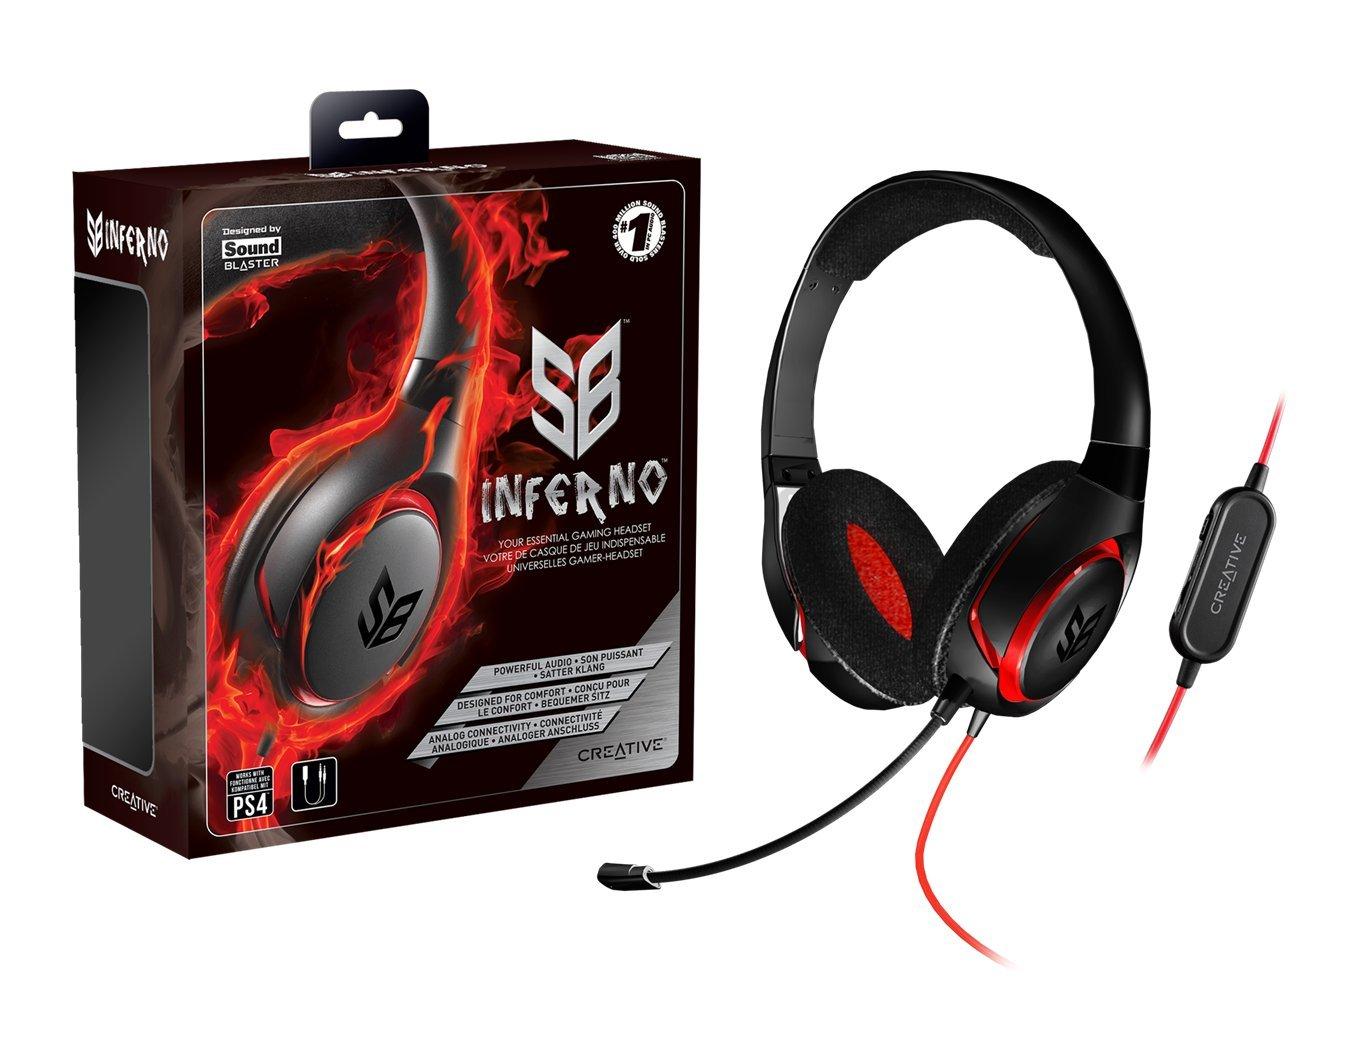 Creative SB Inferno - Auriculares de diadema cerrados con micrófono, negro: Amazon.es: Electrónica